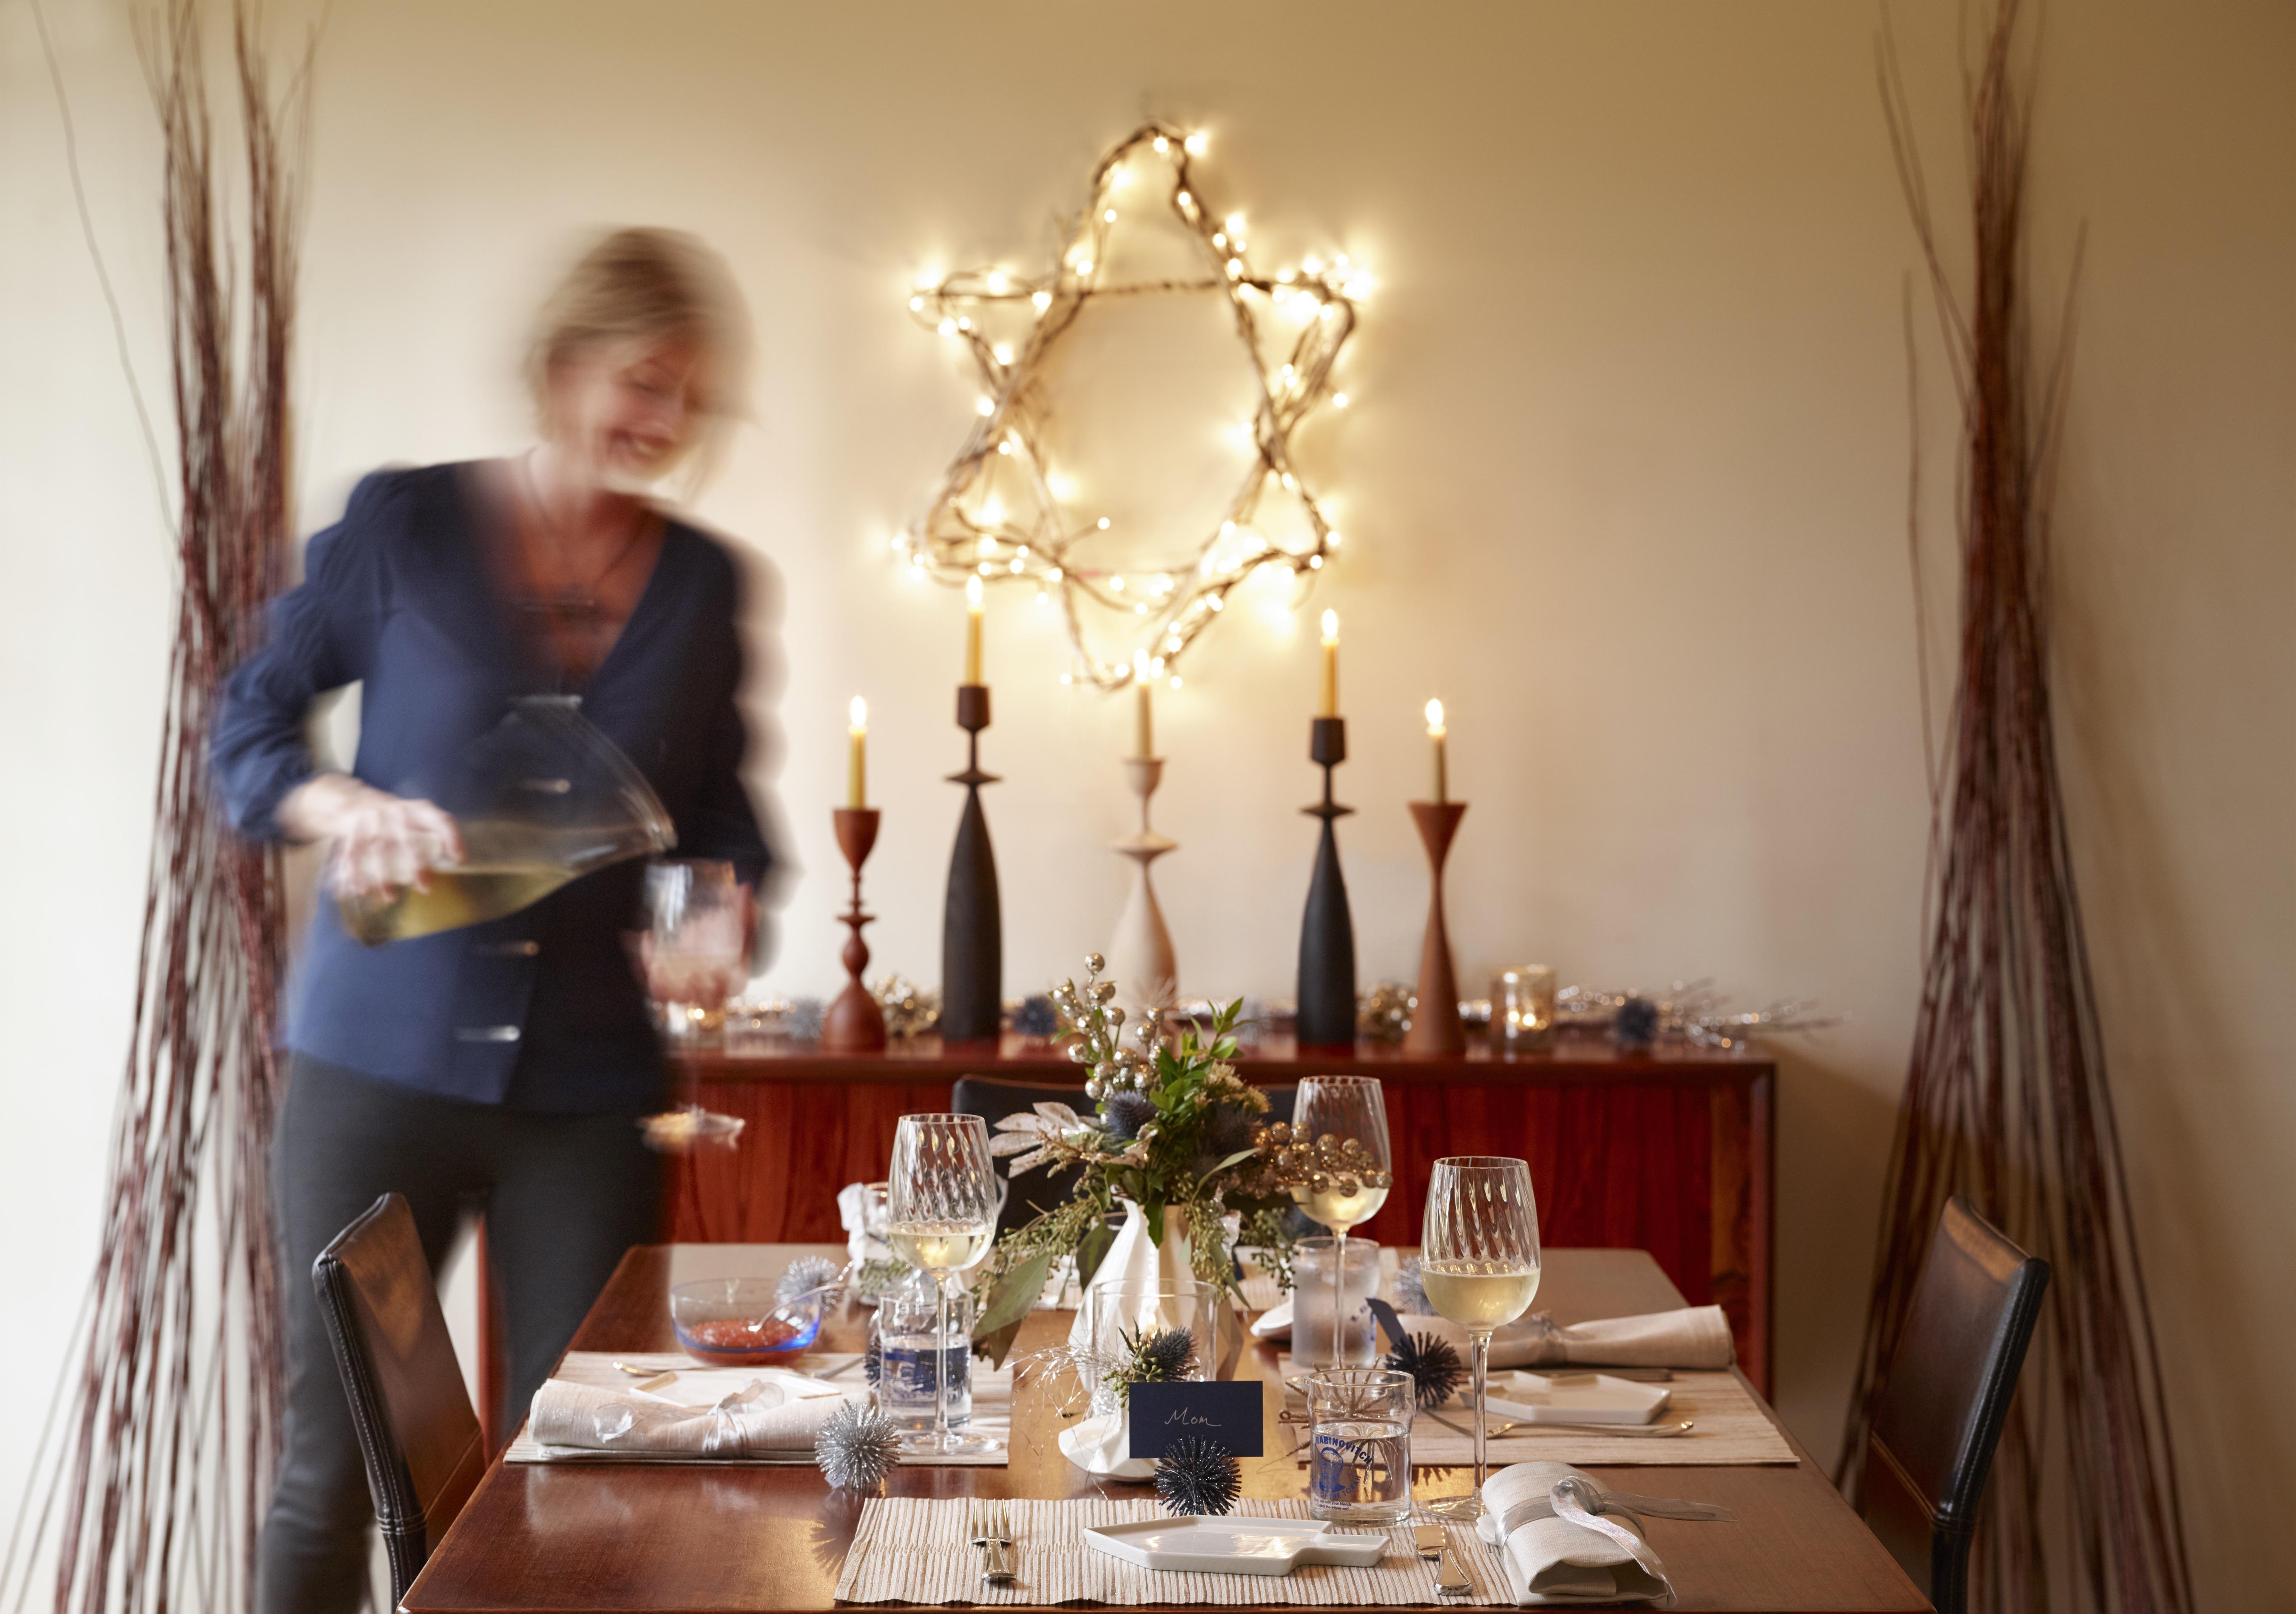 Beautiful and Inspirational Ways to Decorate for Hanukkah